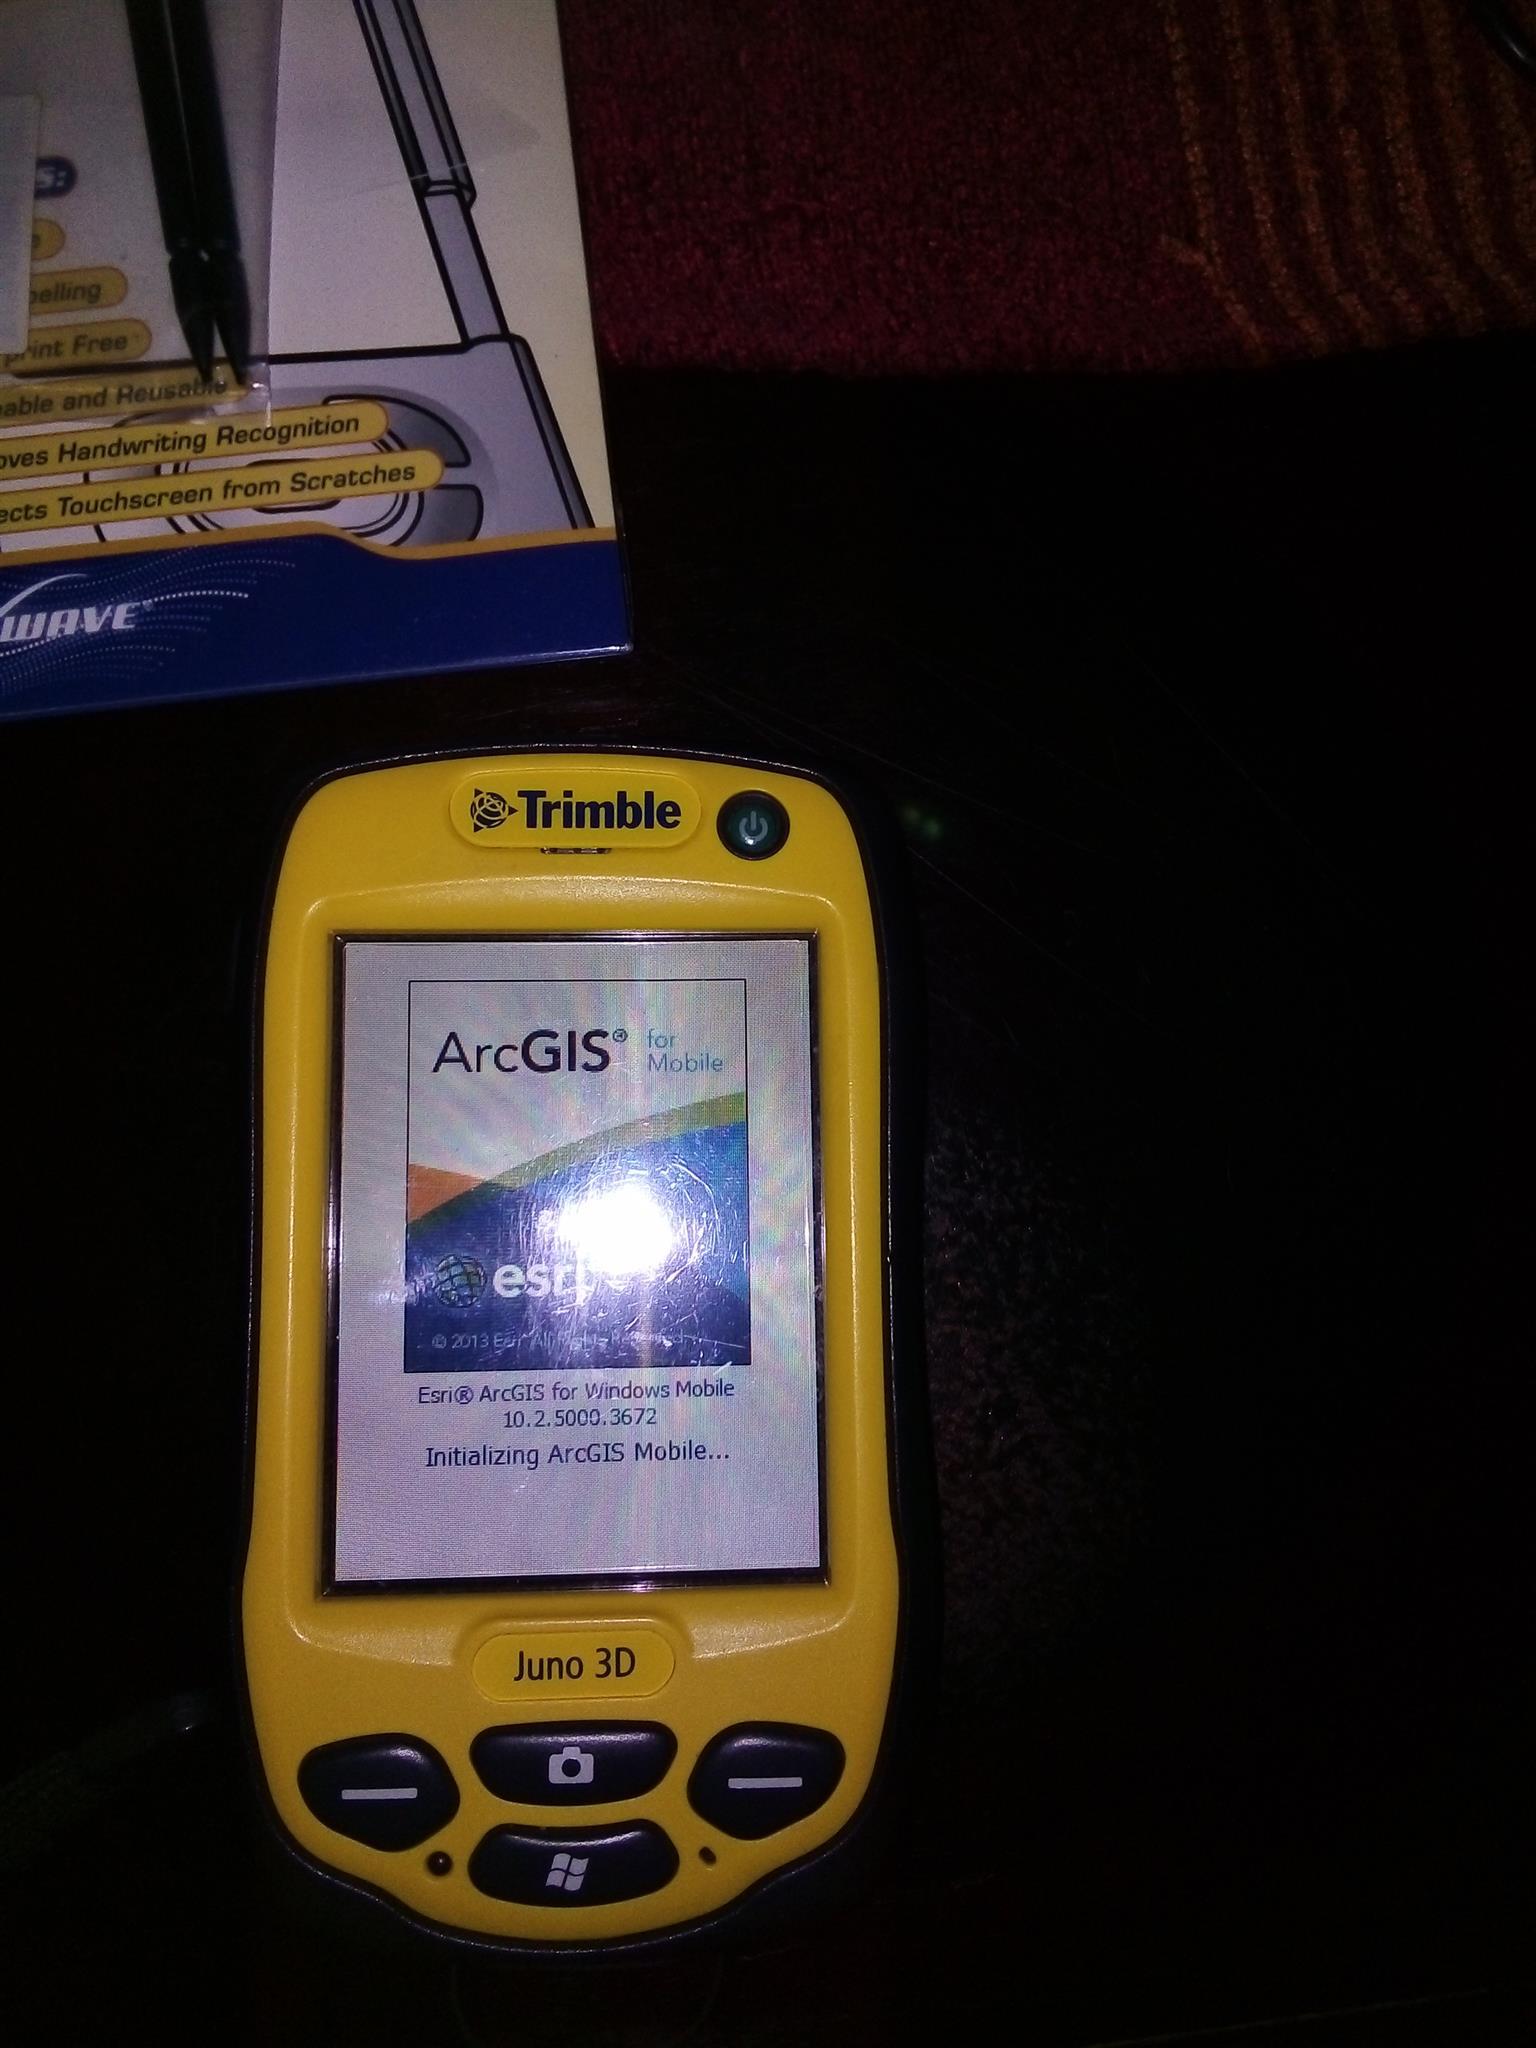 Trimble Juno 3D handheld